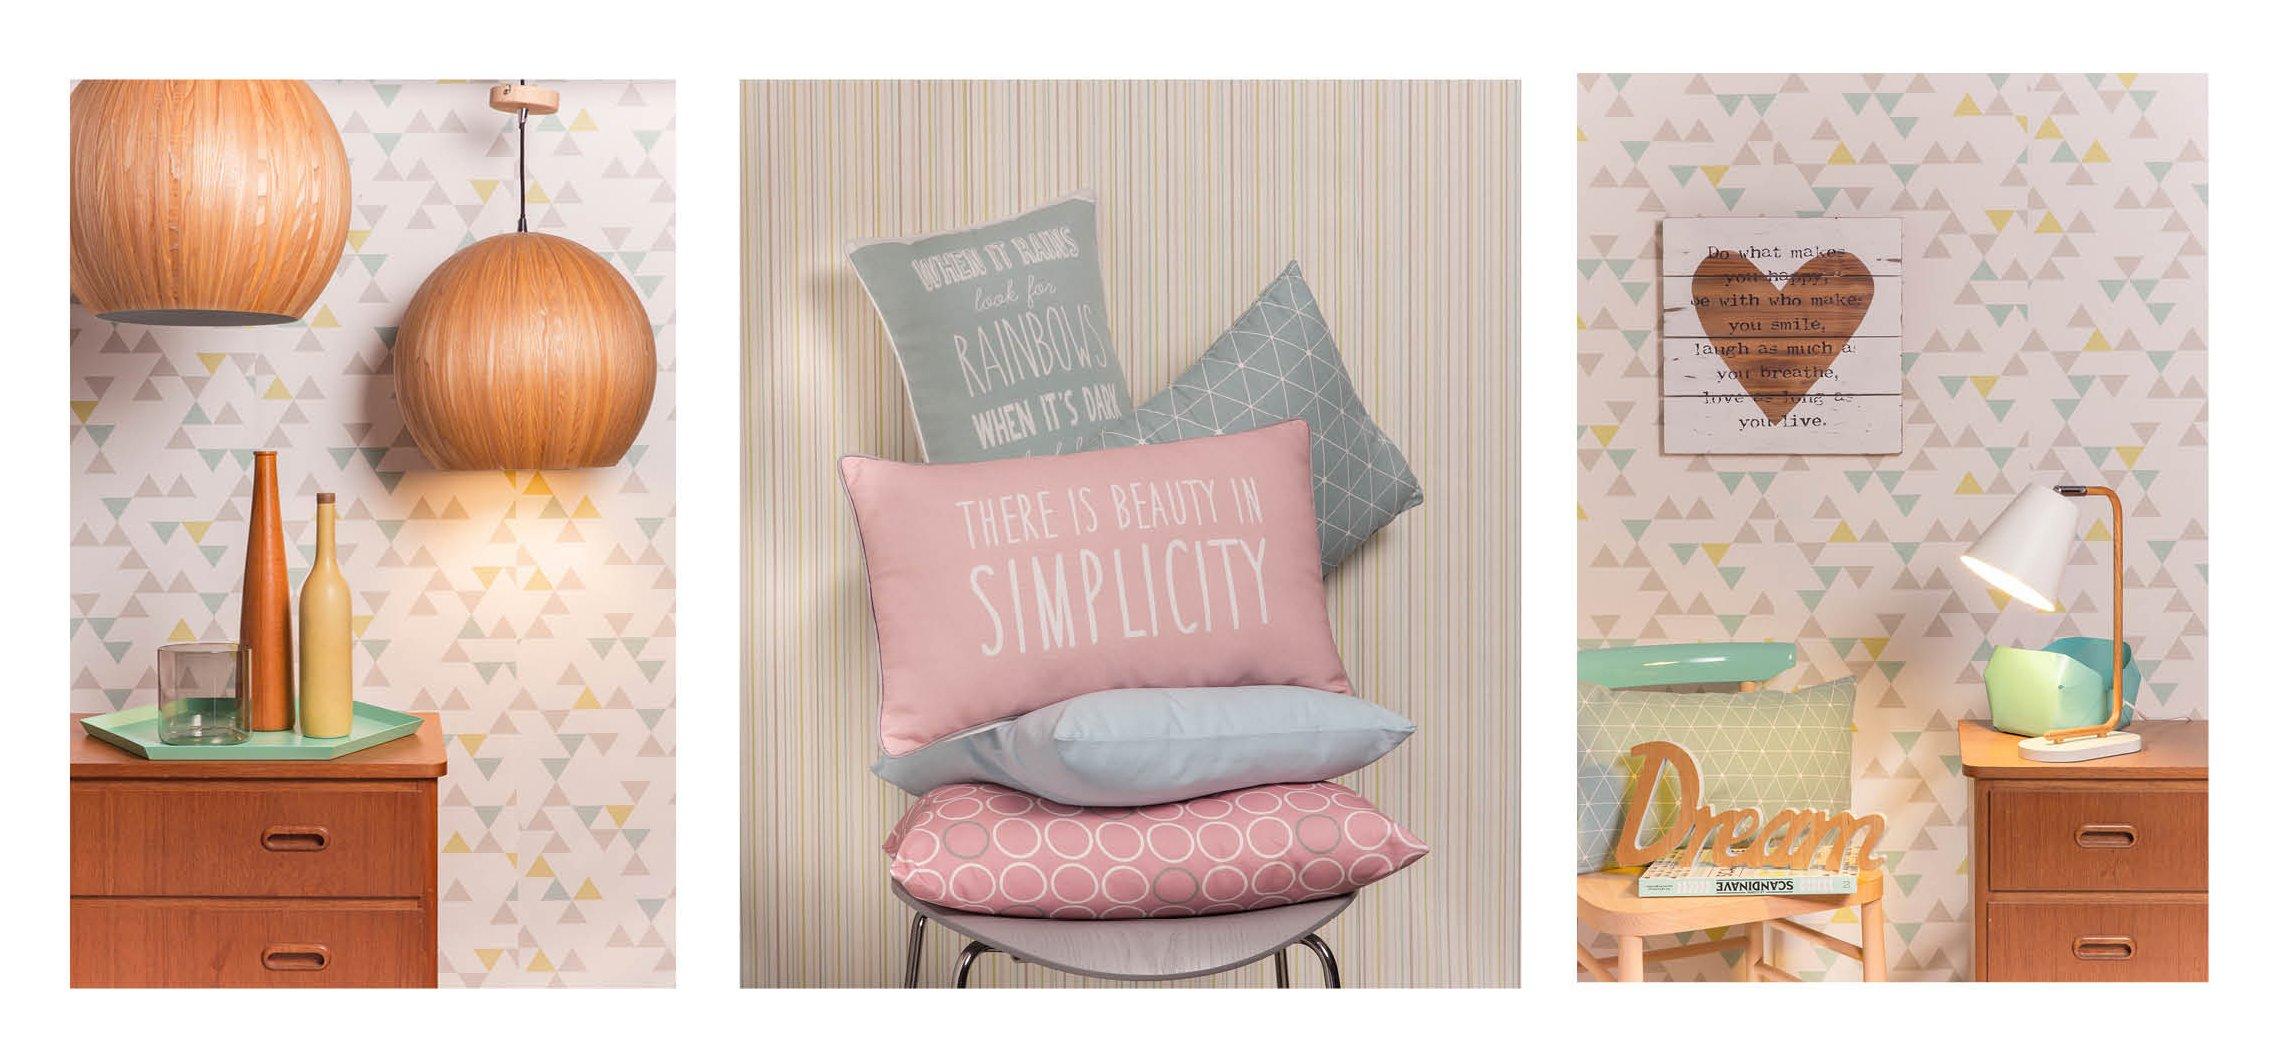 Cuscino simplicity rosa uac lampadario bolstar uac tutto for Carta parati mattoni leroy merlin